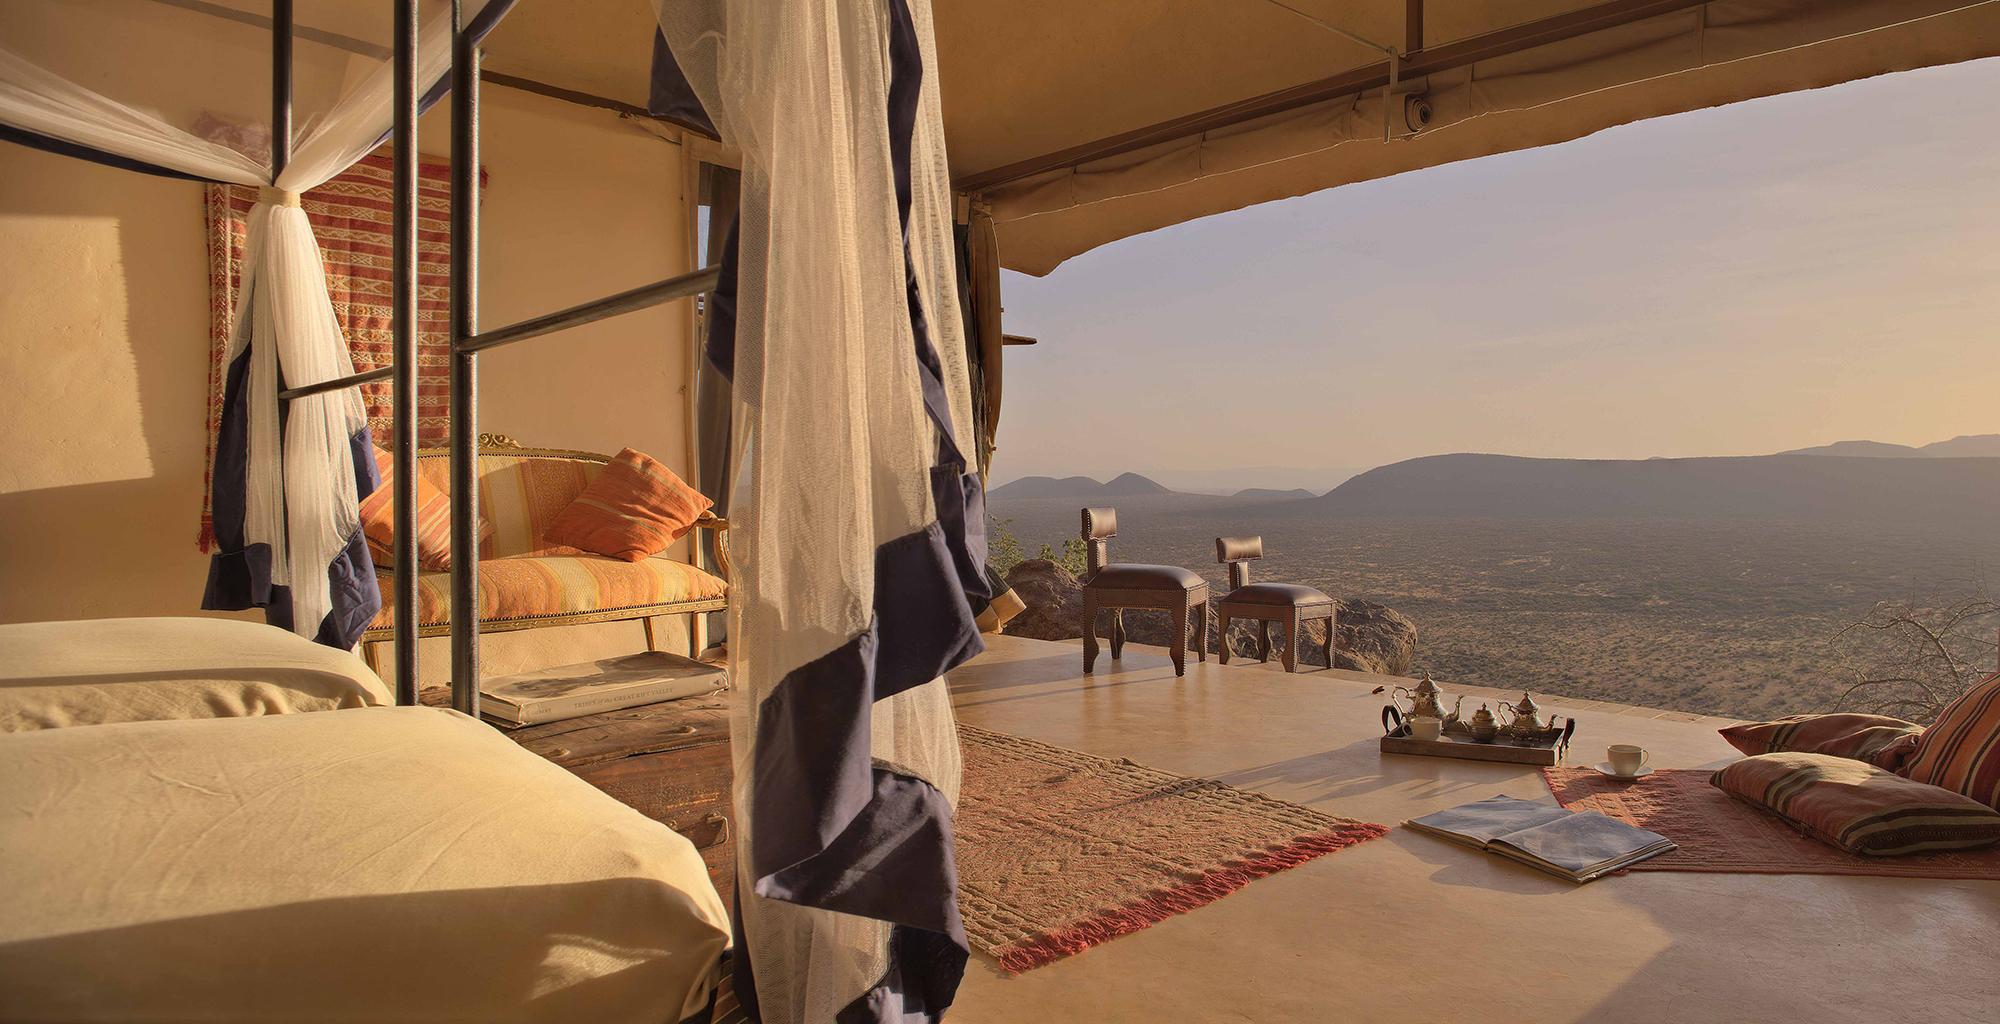 Kenya-Saruni-Samburu-Bedroom